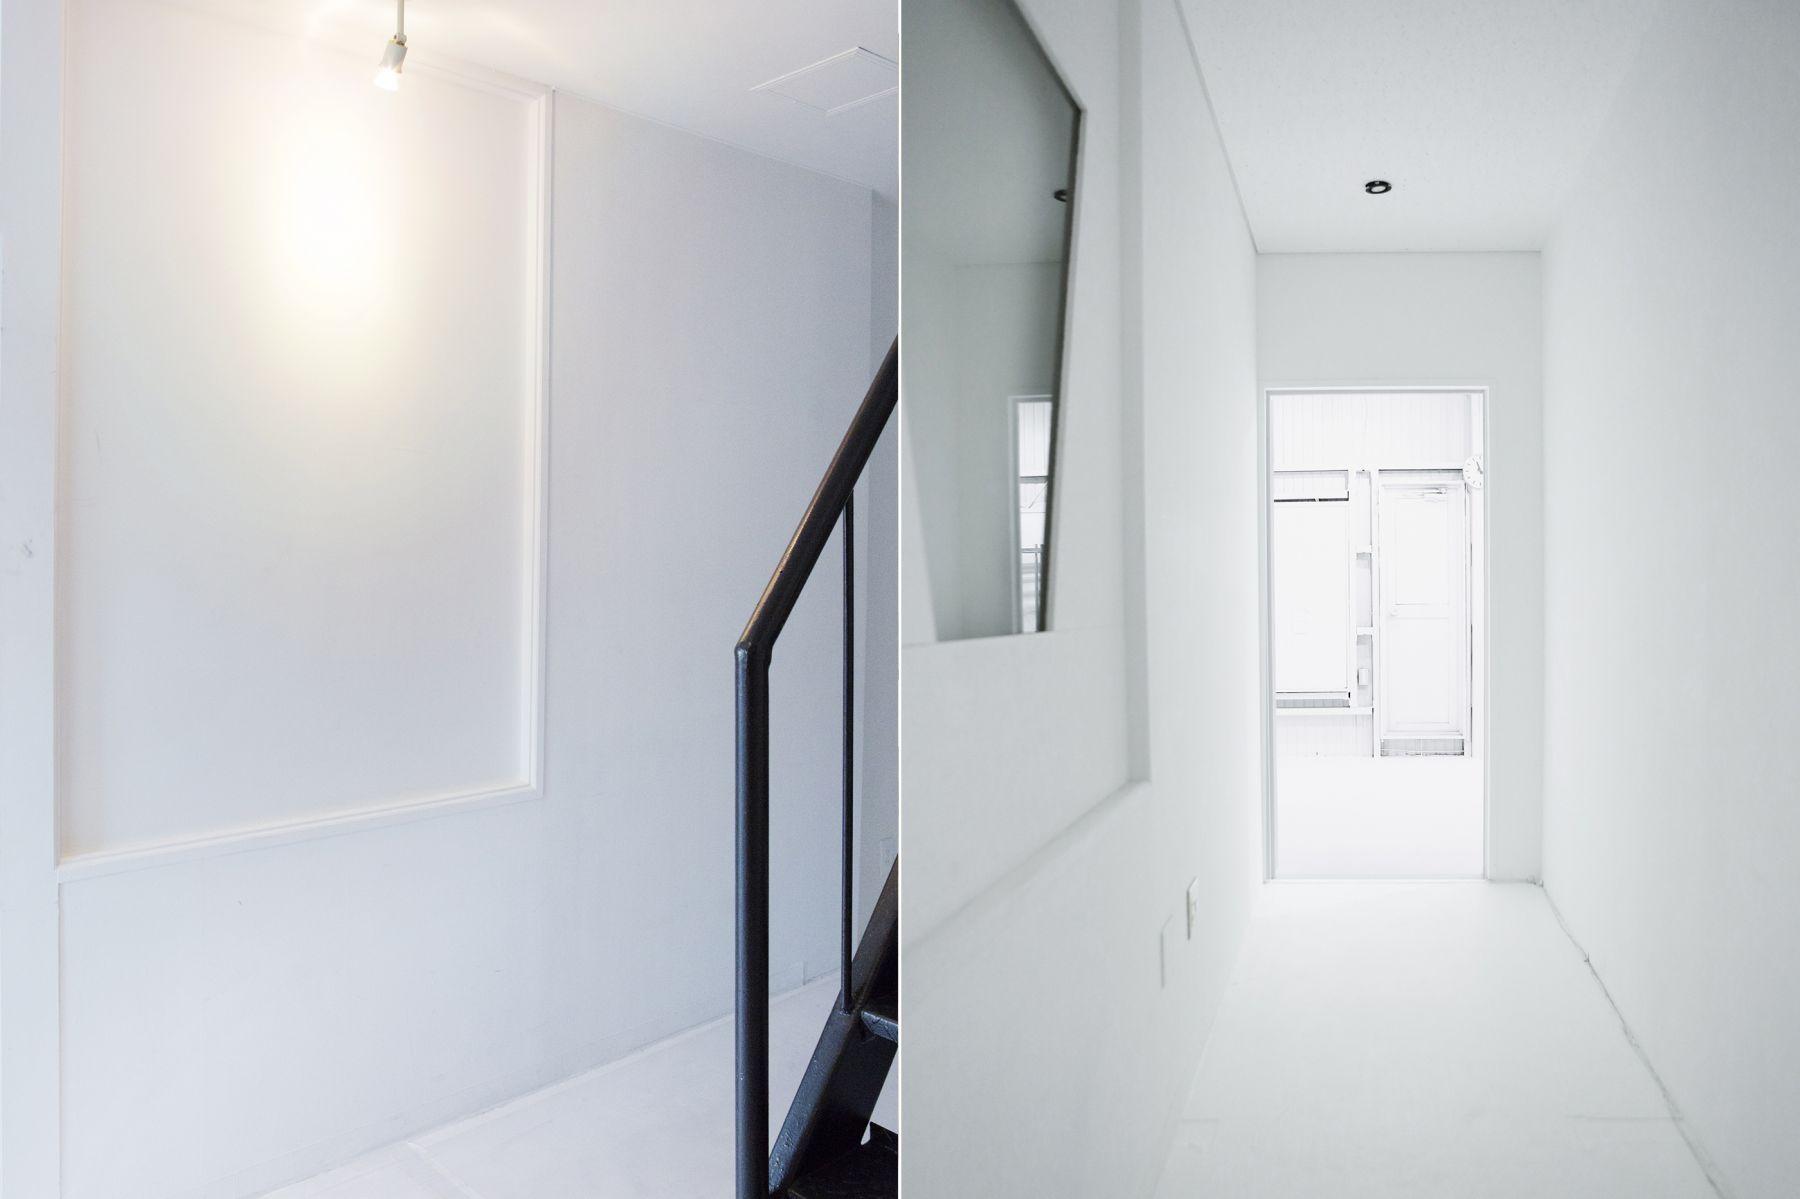 studio ConTRail (スタジオ コントレイル)廊下も白壁で統一